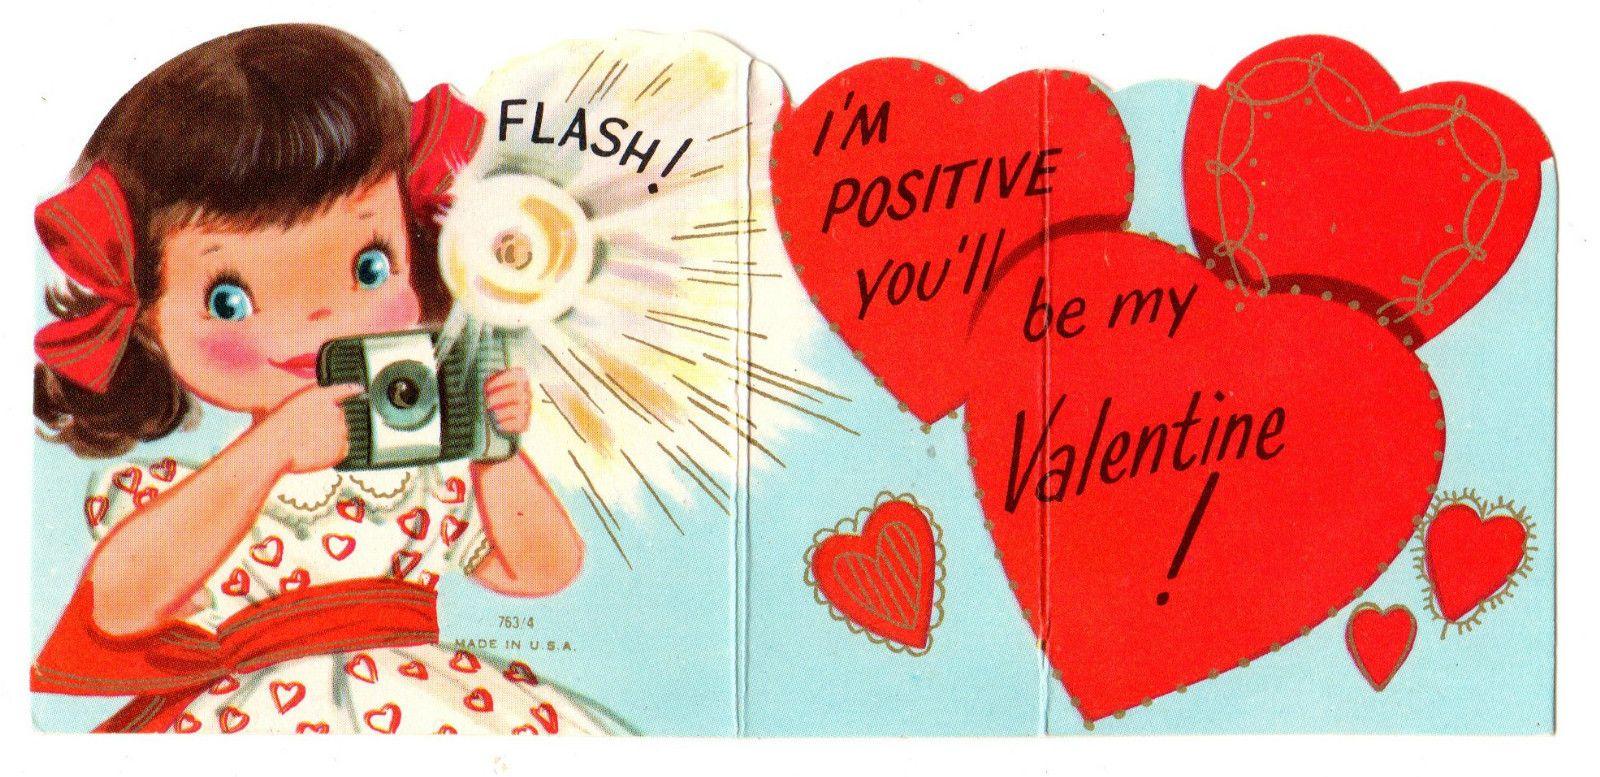 pindaniele on girls vintage valentines 2